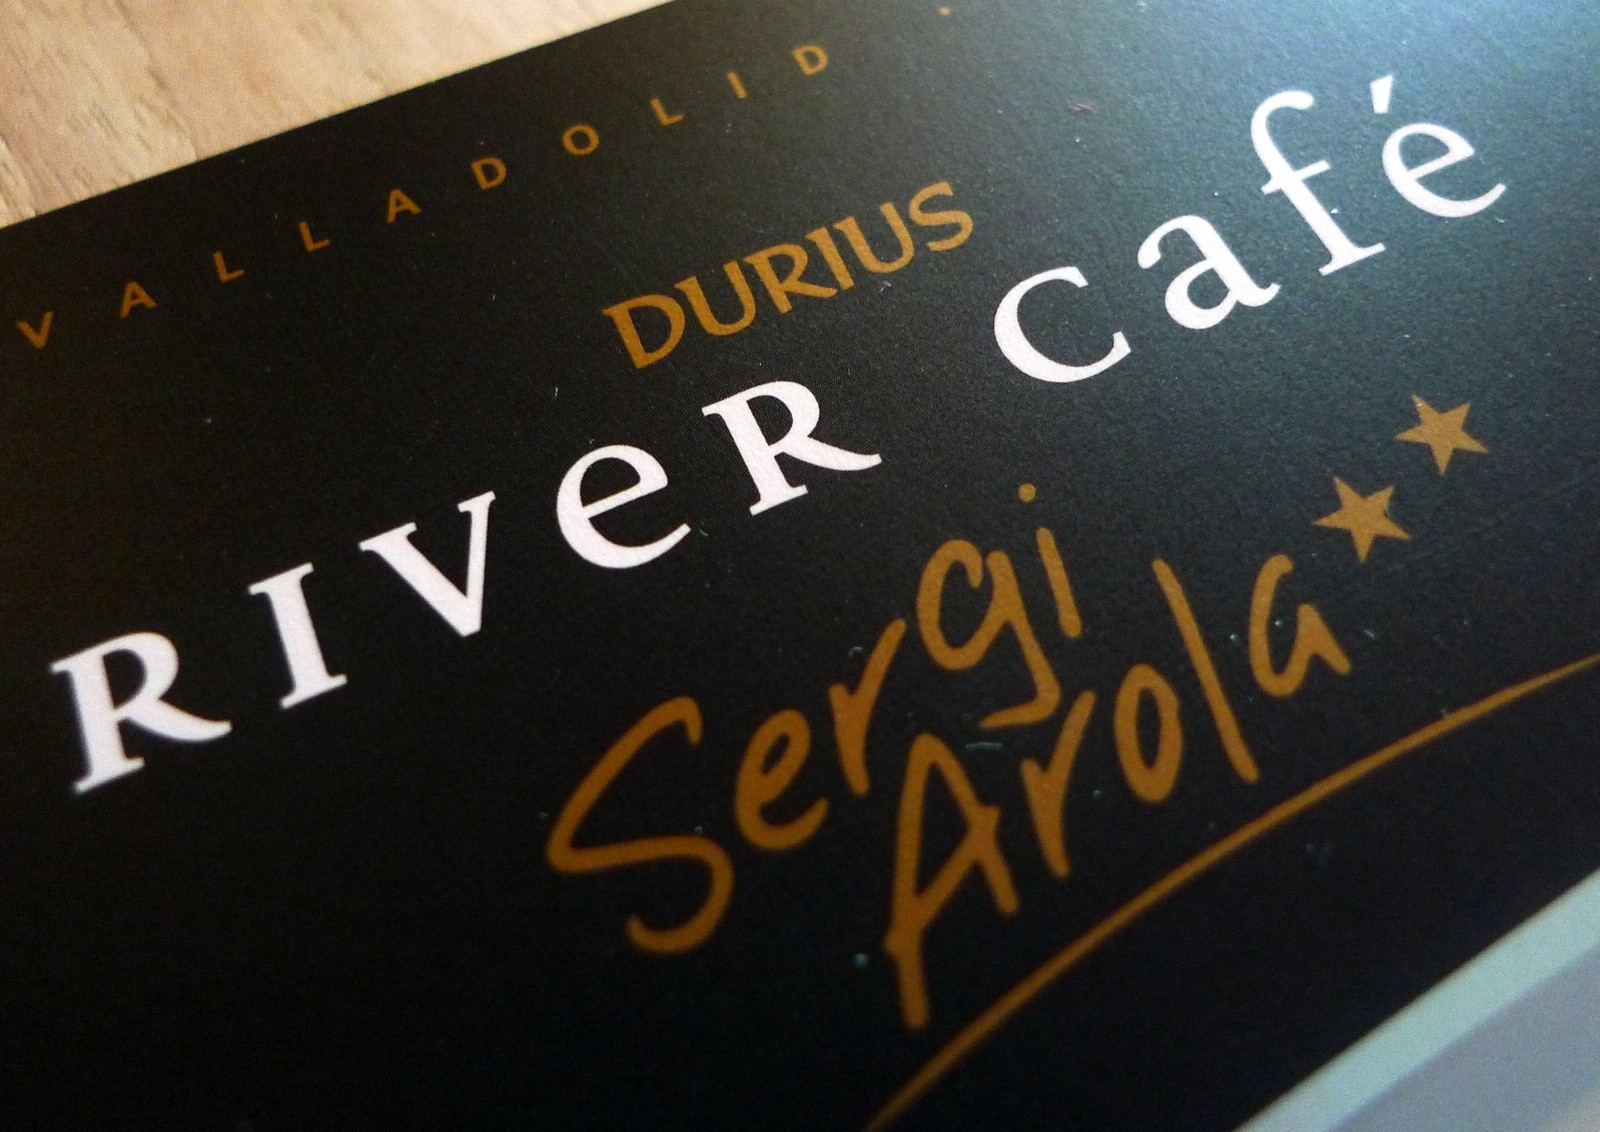 Durius River Cafe - Sergi Arola logo